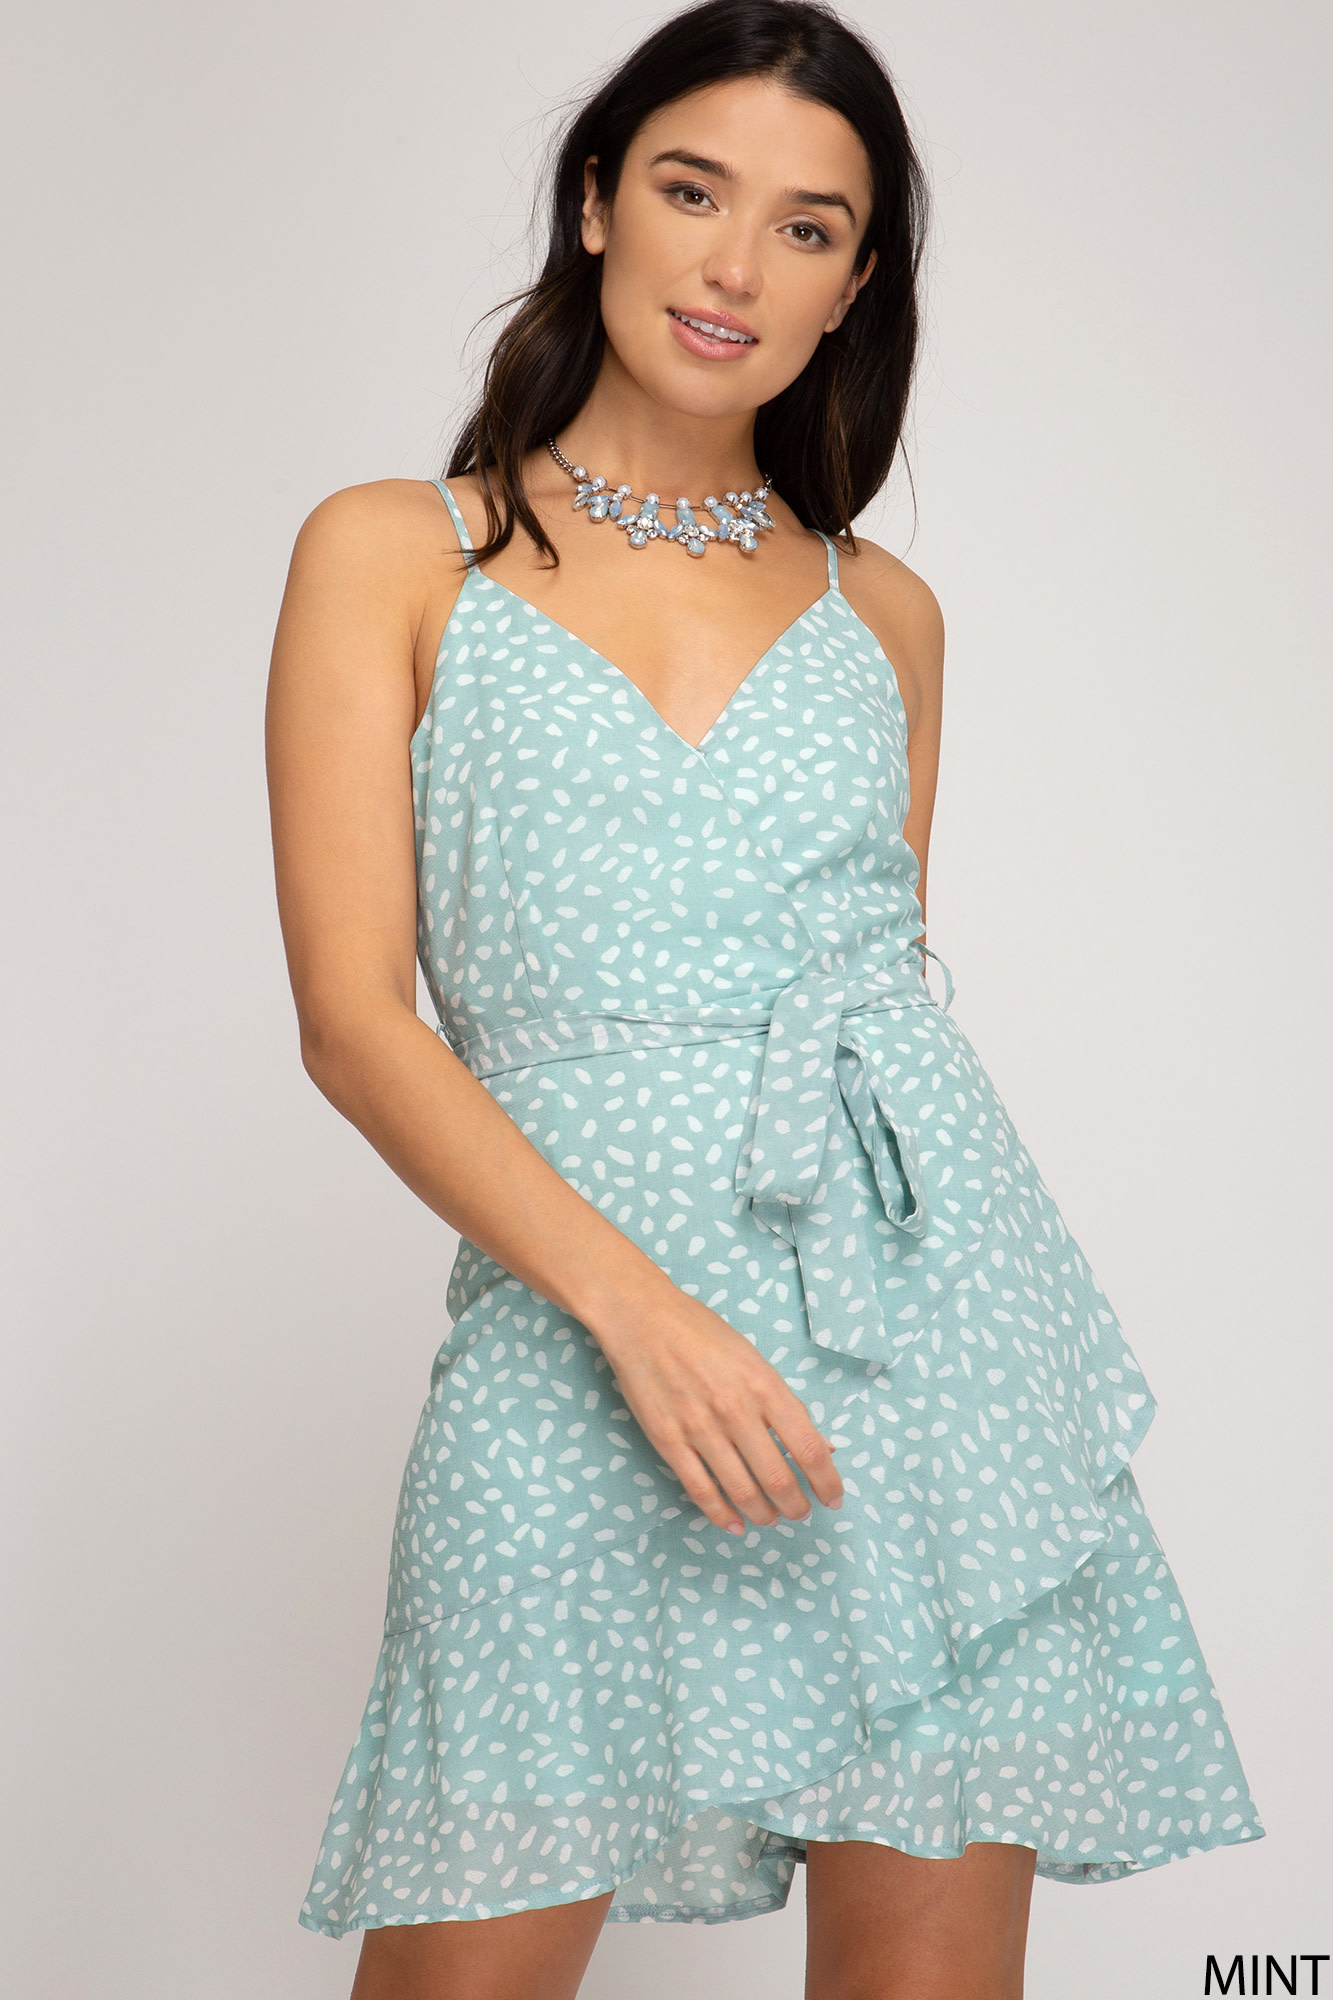 Mint print surplice dress w/flounce skirt